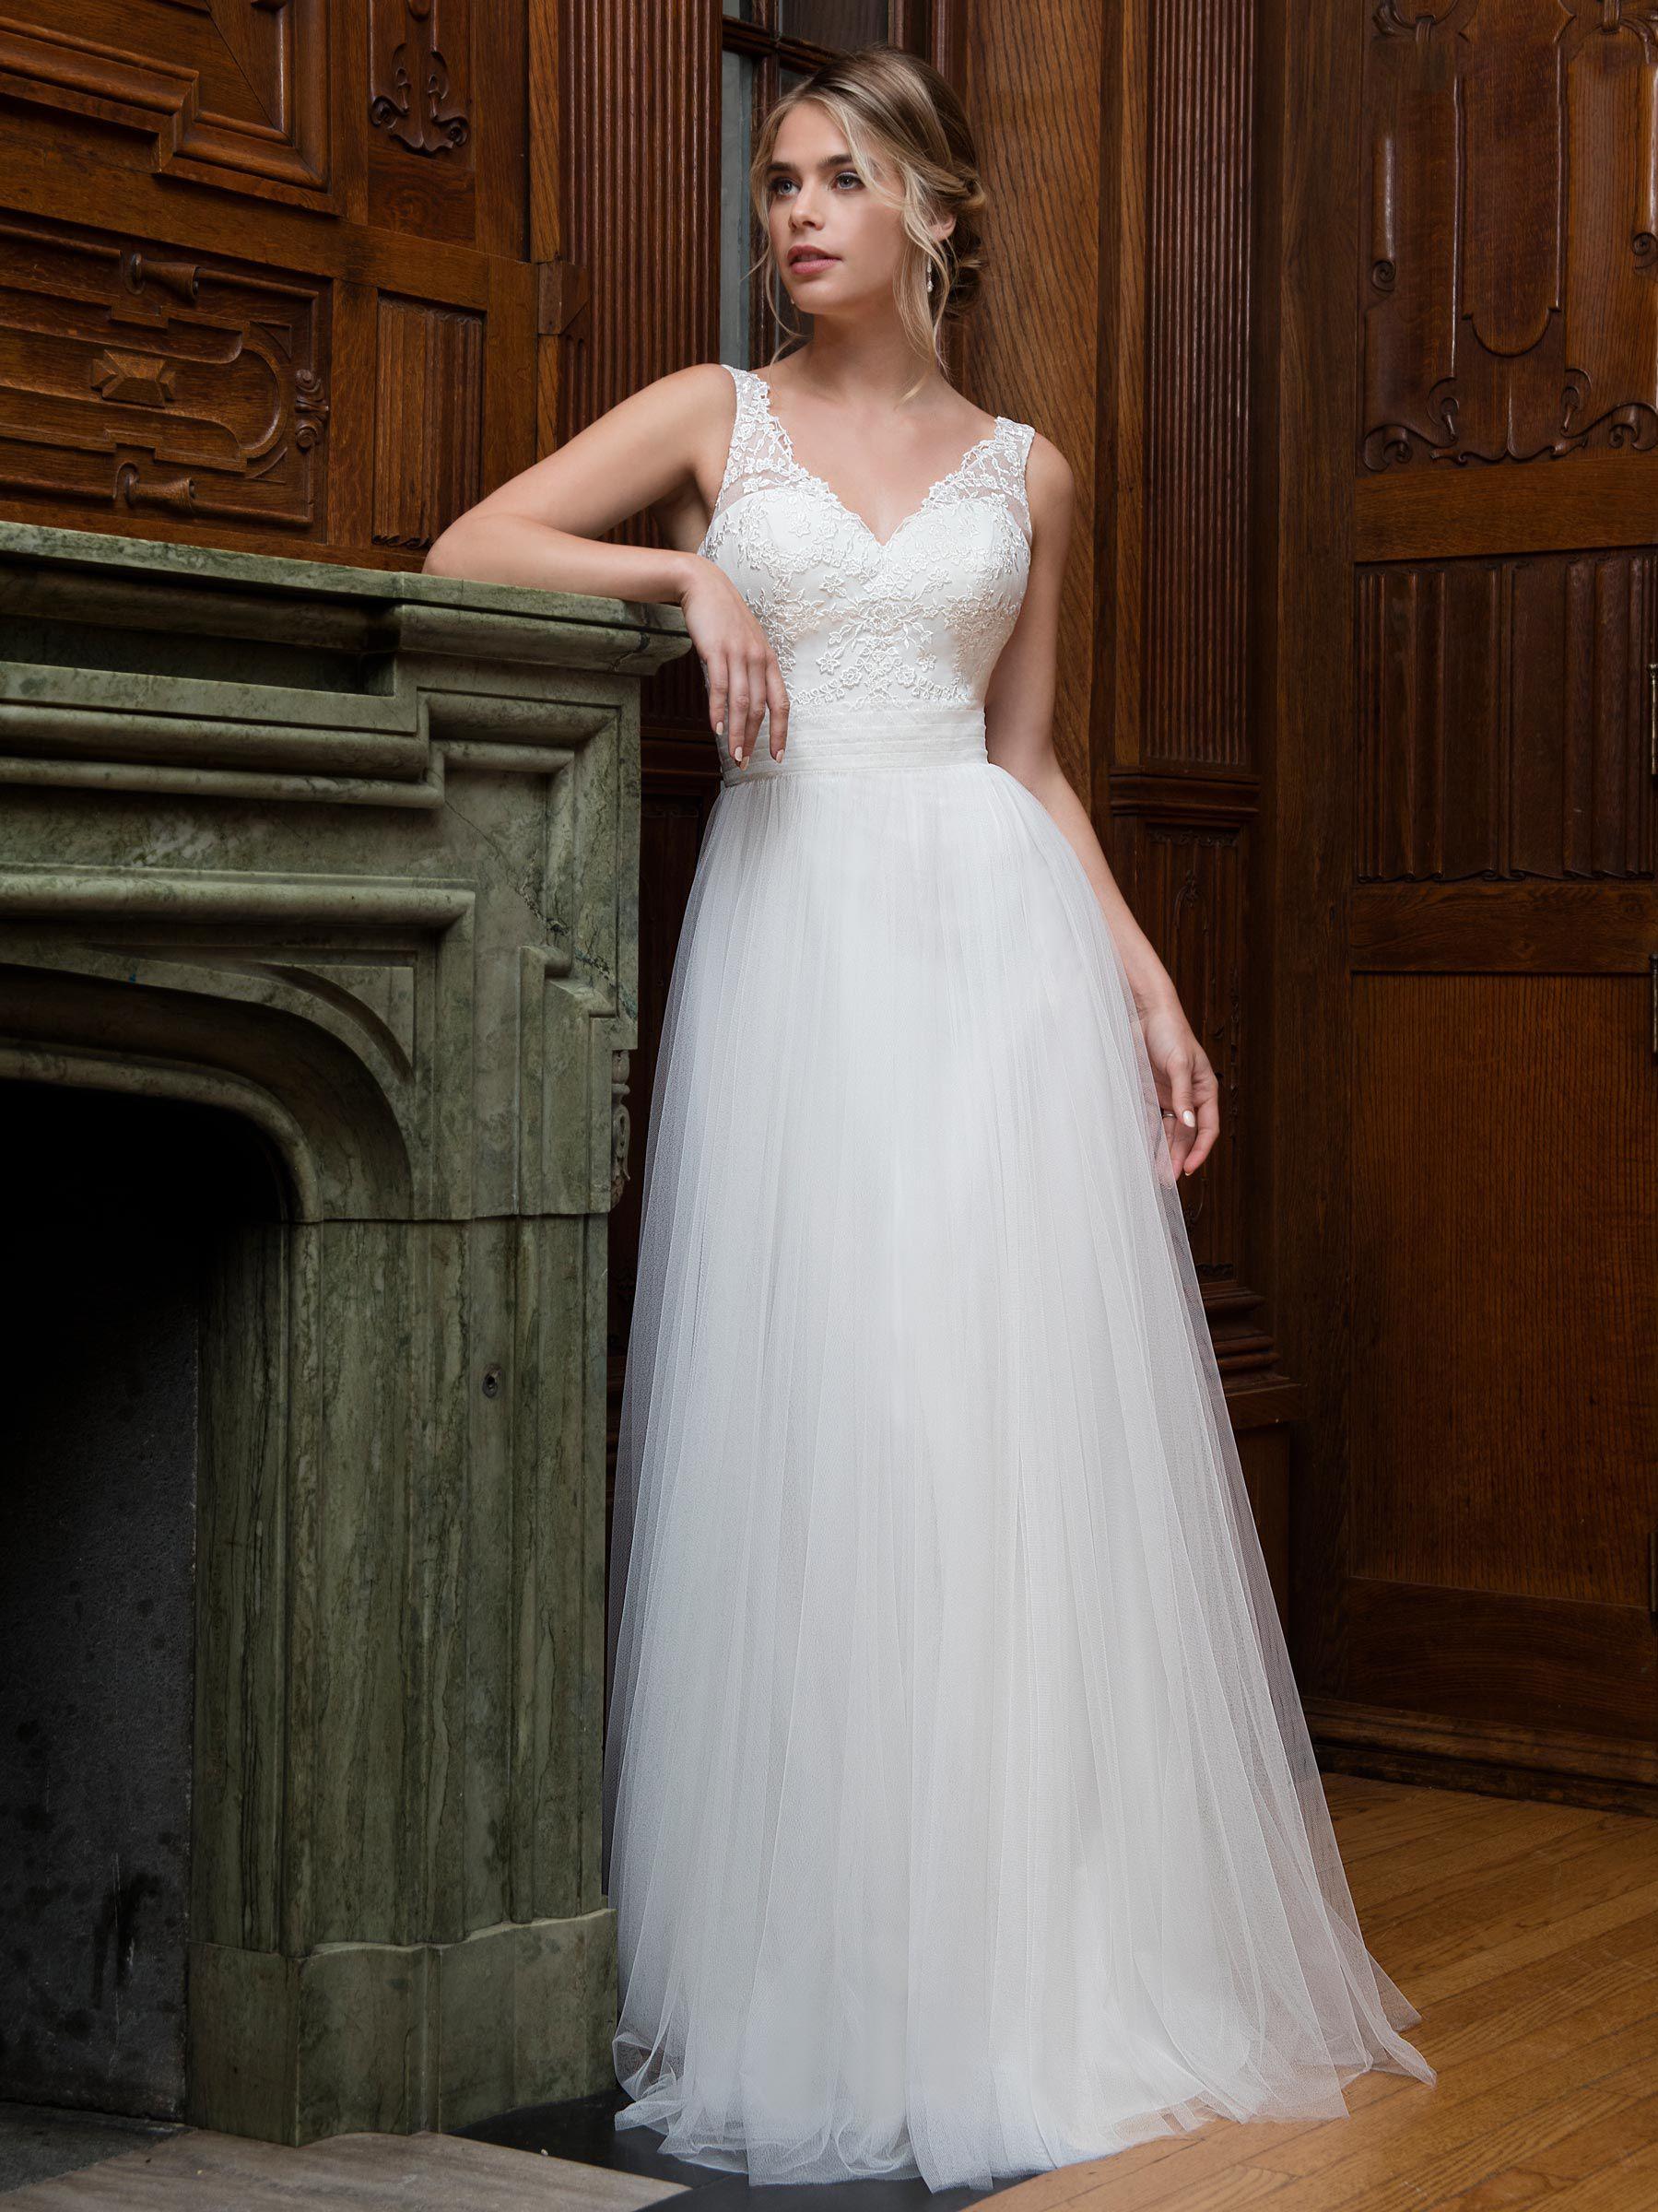 Free Wrap White Ivory Tulle V Neck Applique Sheath Wedding Dresses